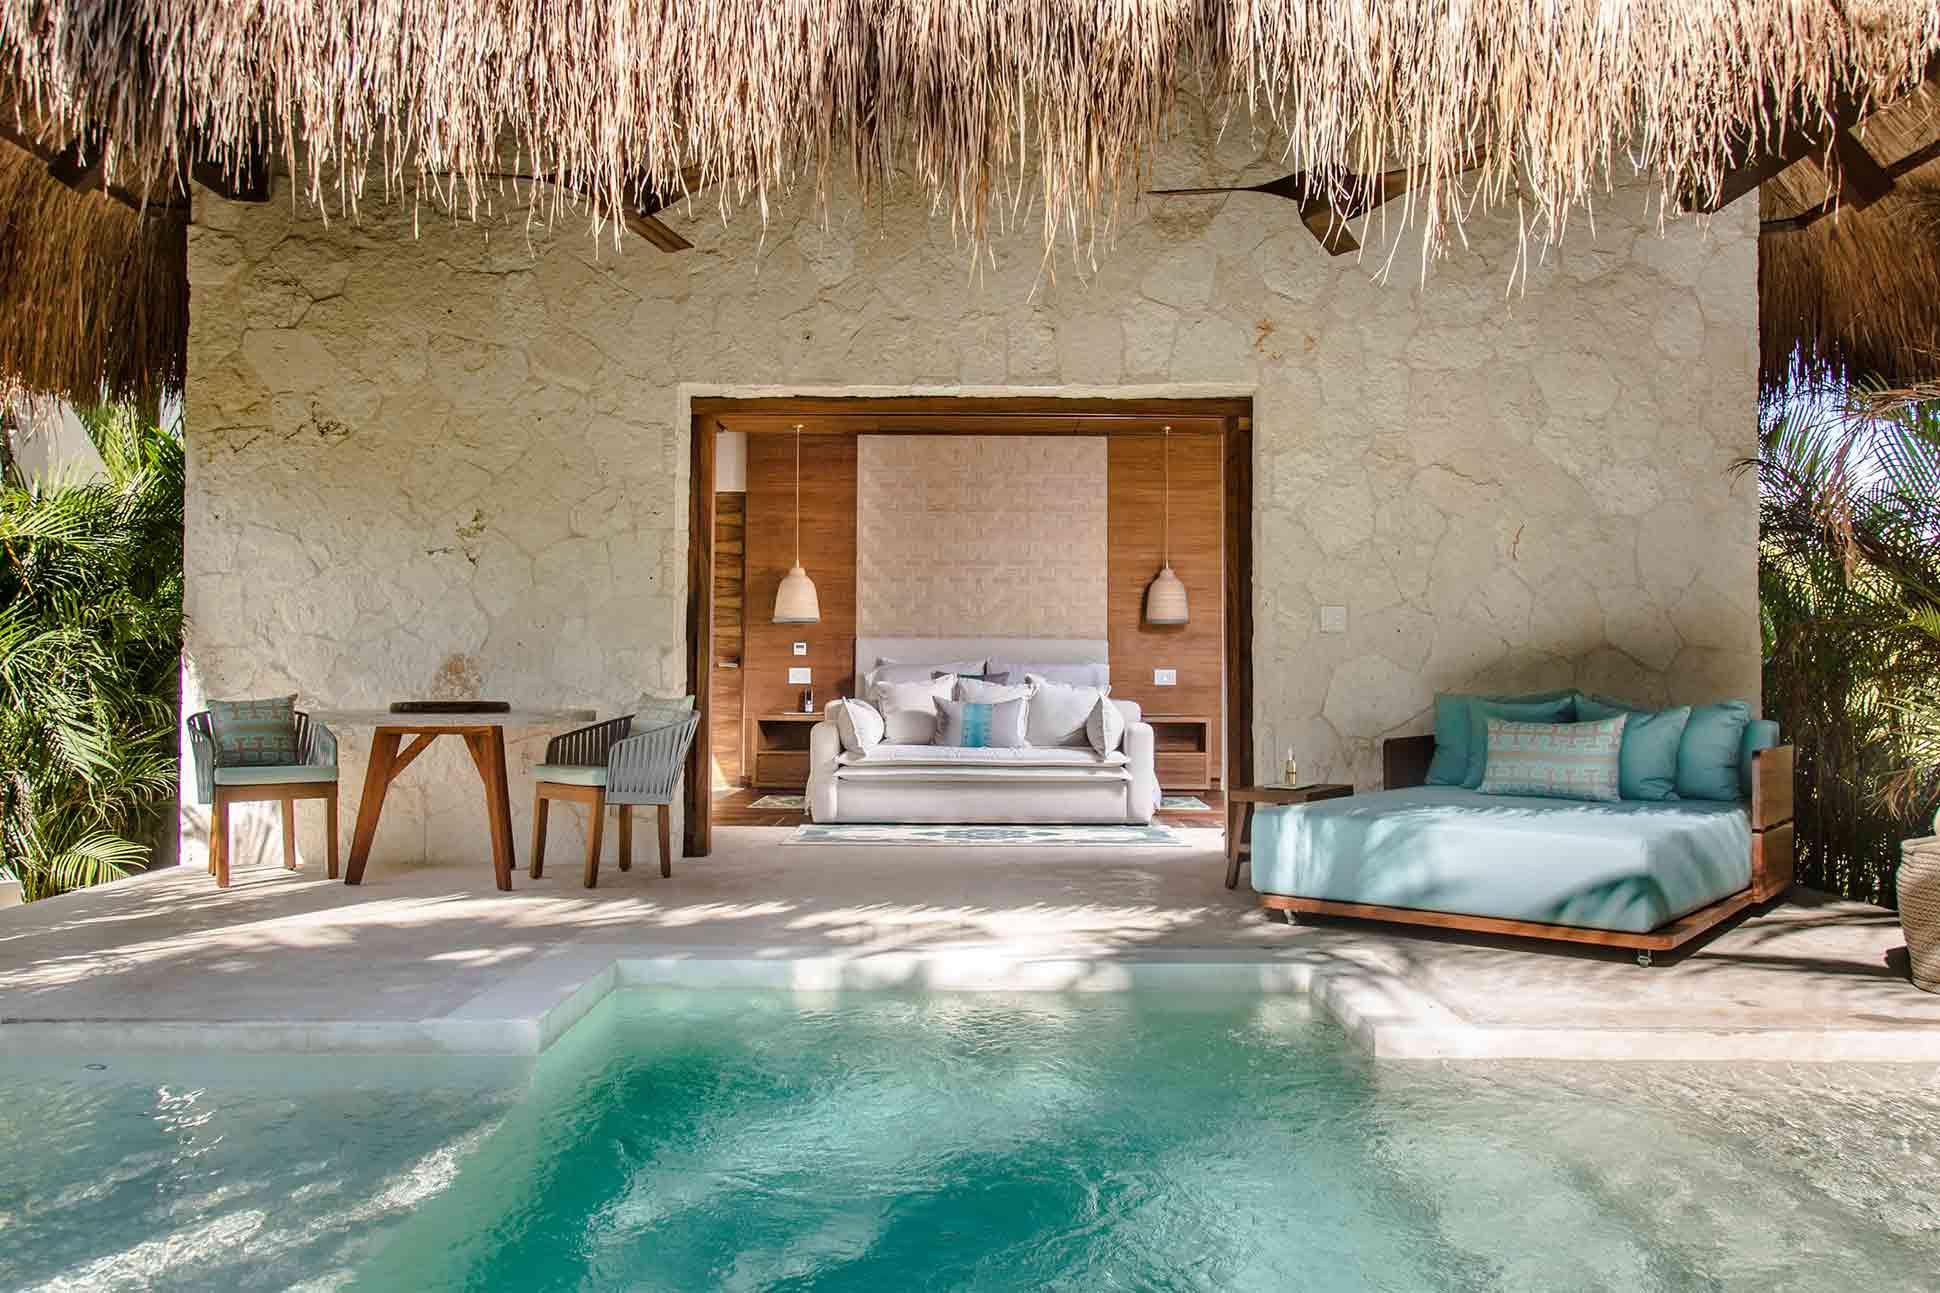 Chablé Hotels: <br> Happy days